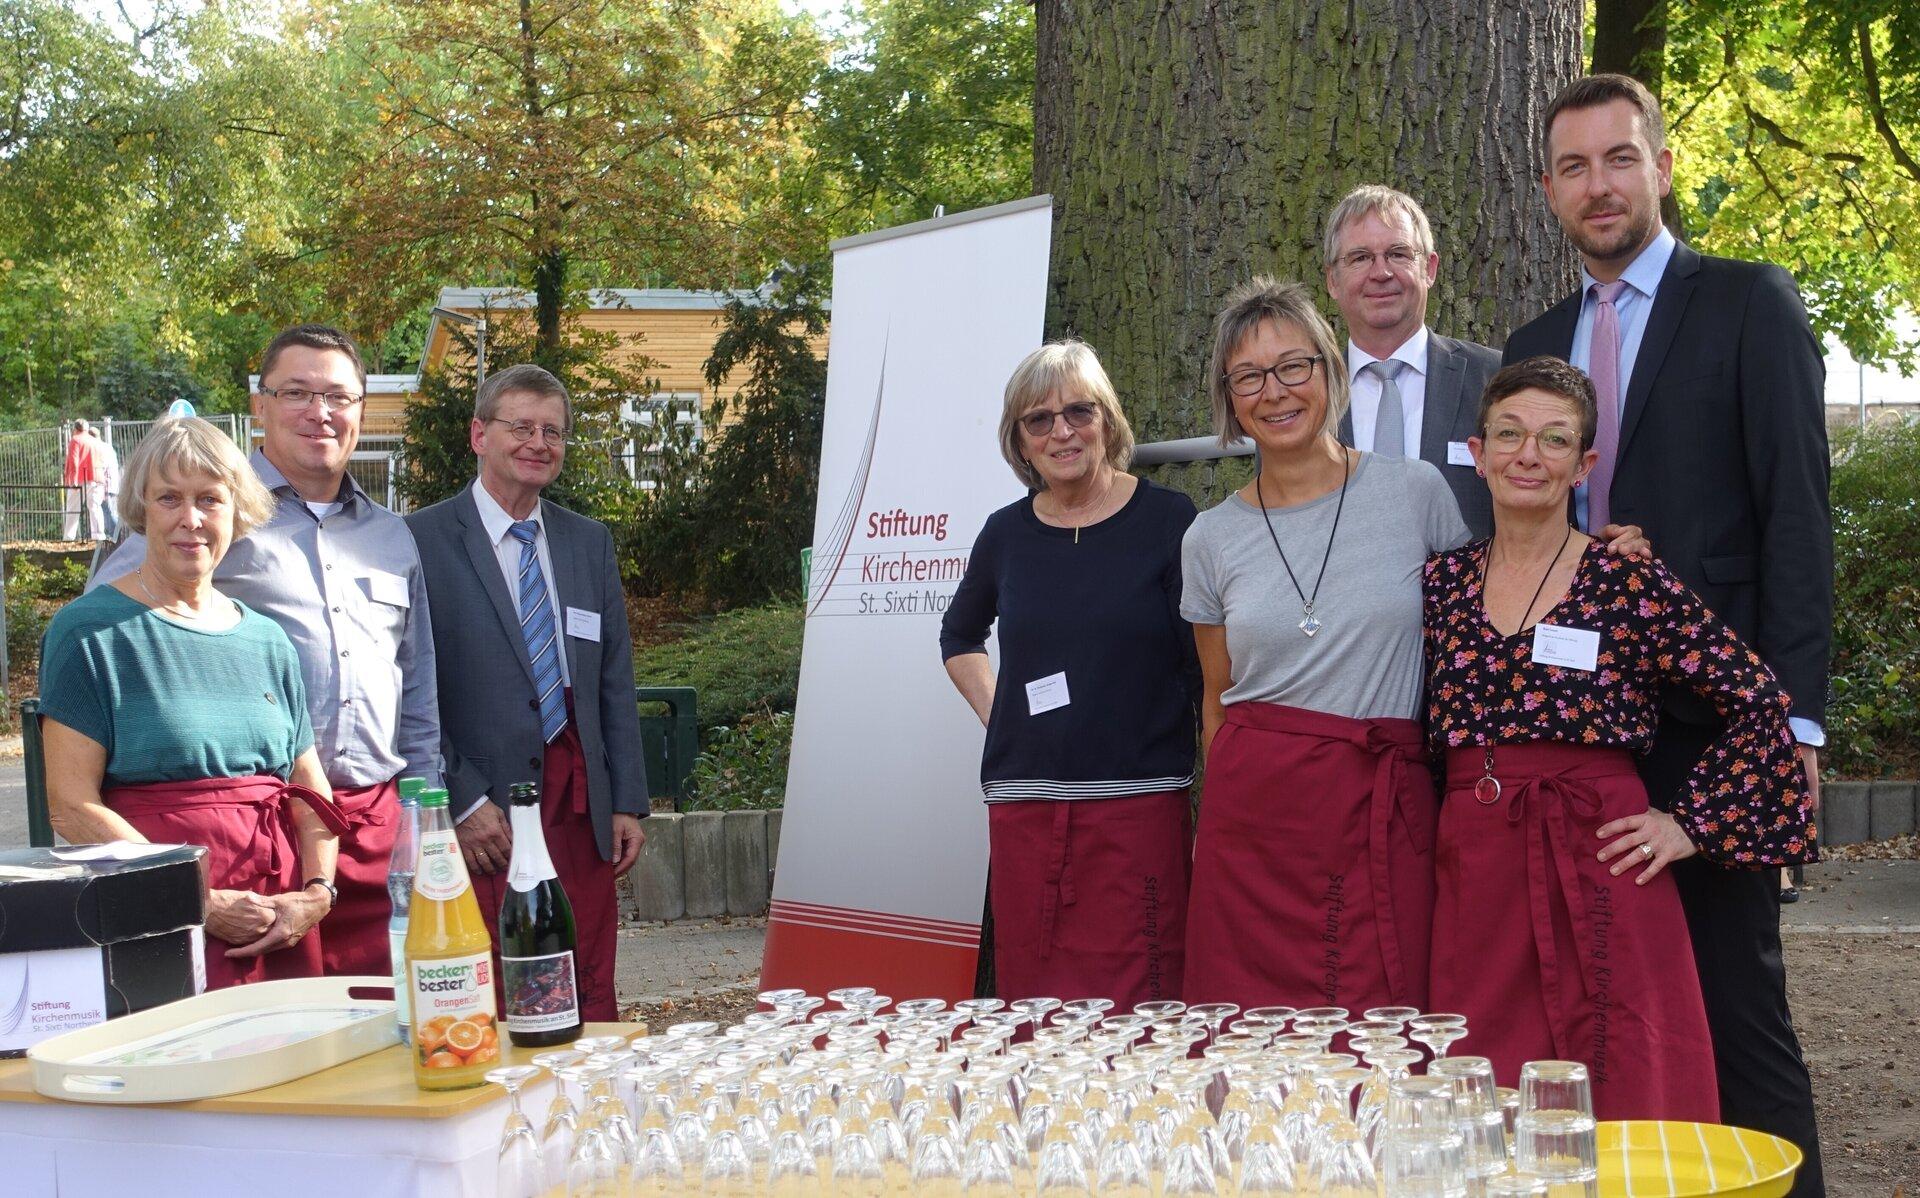 Stiftung Kirchenmusik an St. Sixti